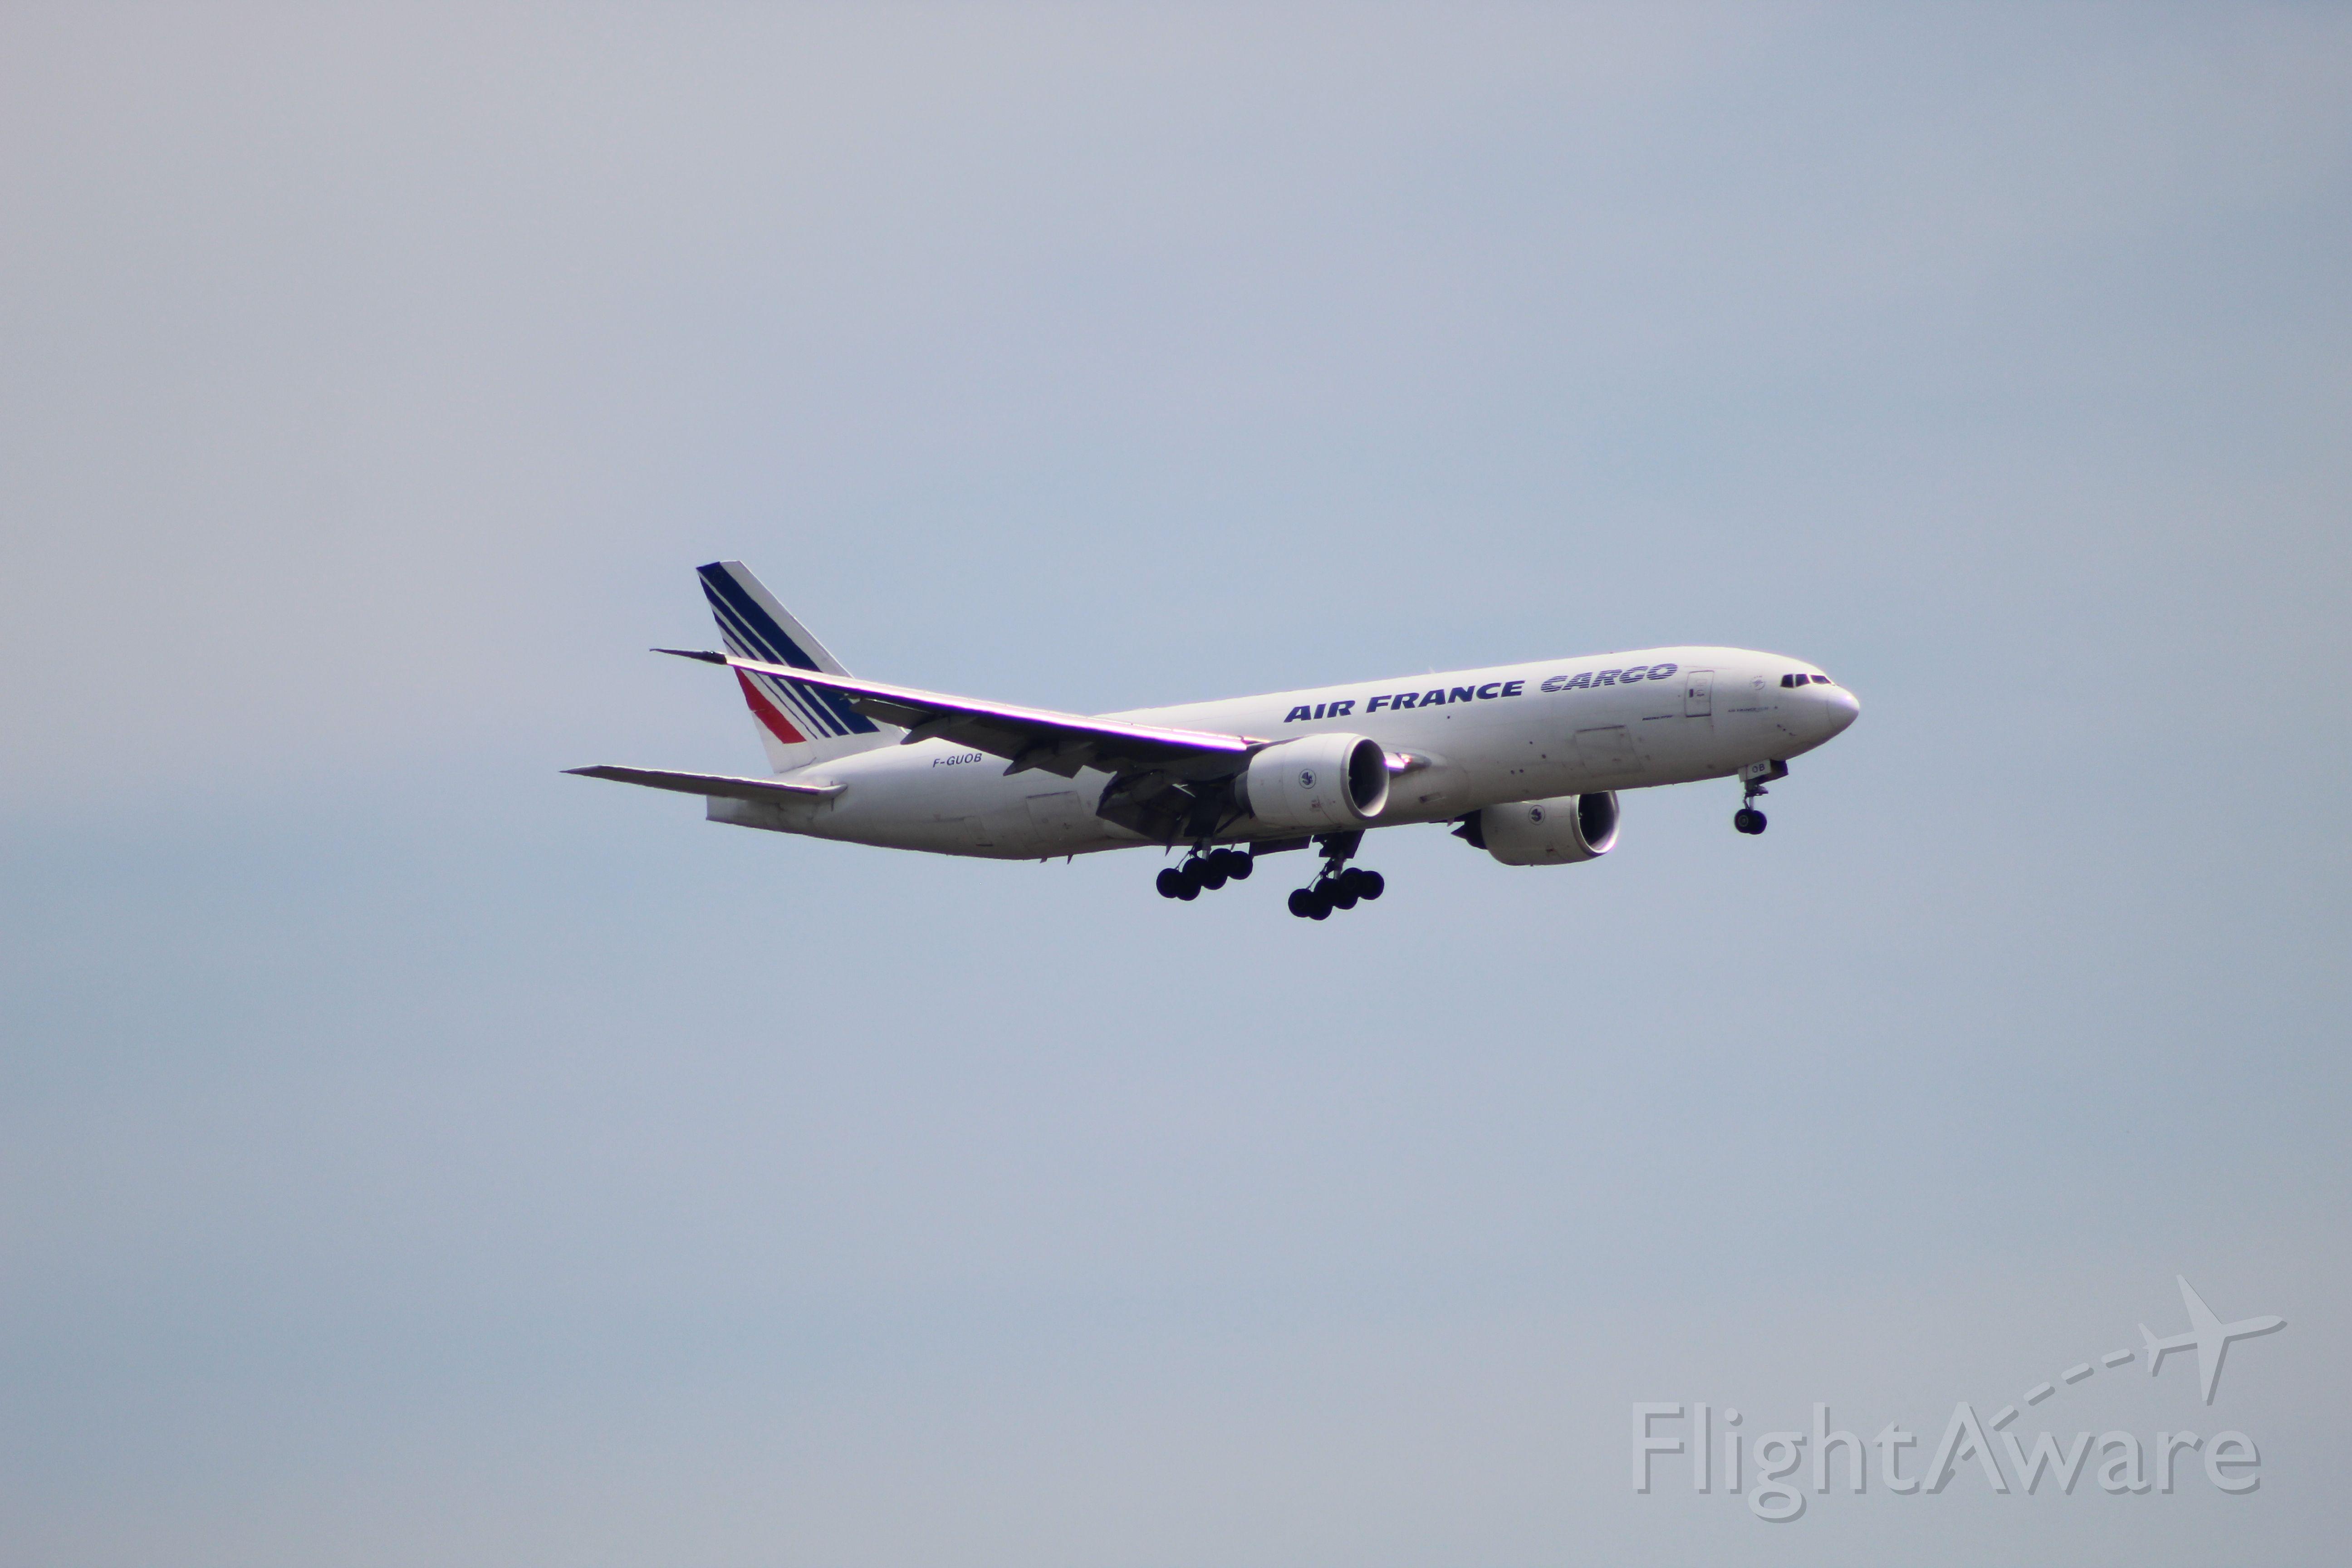 BOEING 777-200LR (F-GUOB) - AFR6738 from Paris (CDG) on 7/14/20. Landing on runway 28C.